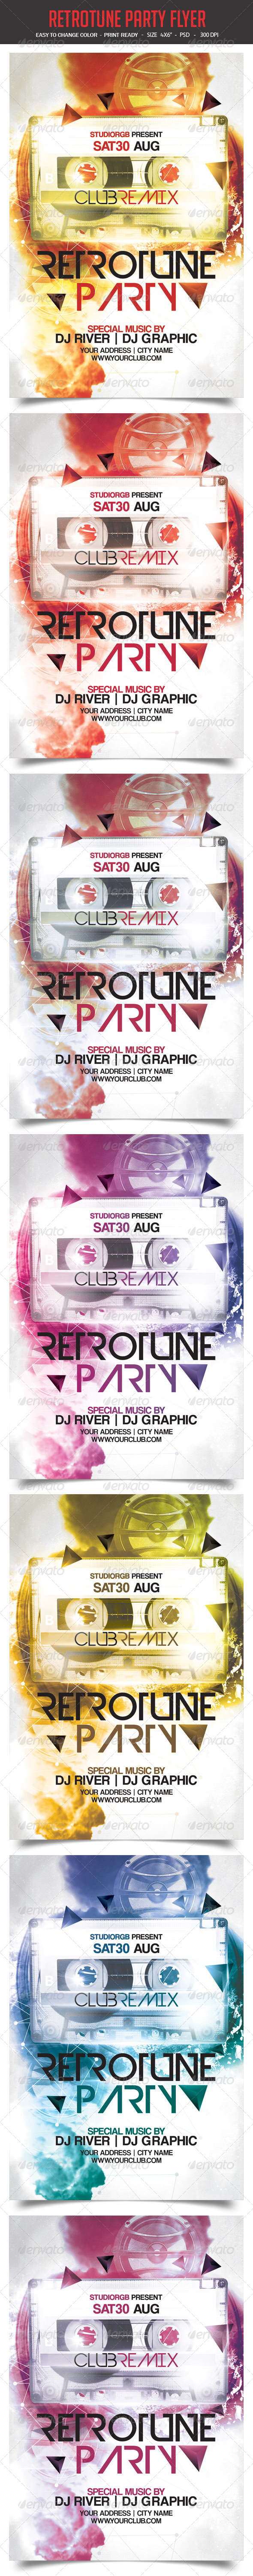 Retro Tune Party Flyer